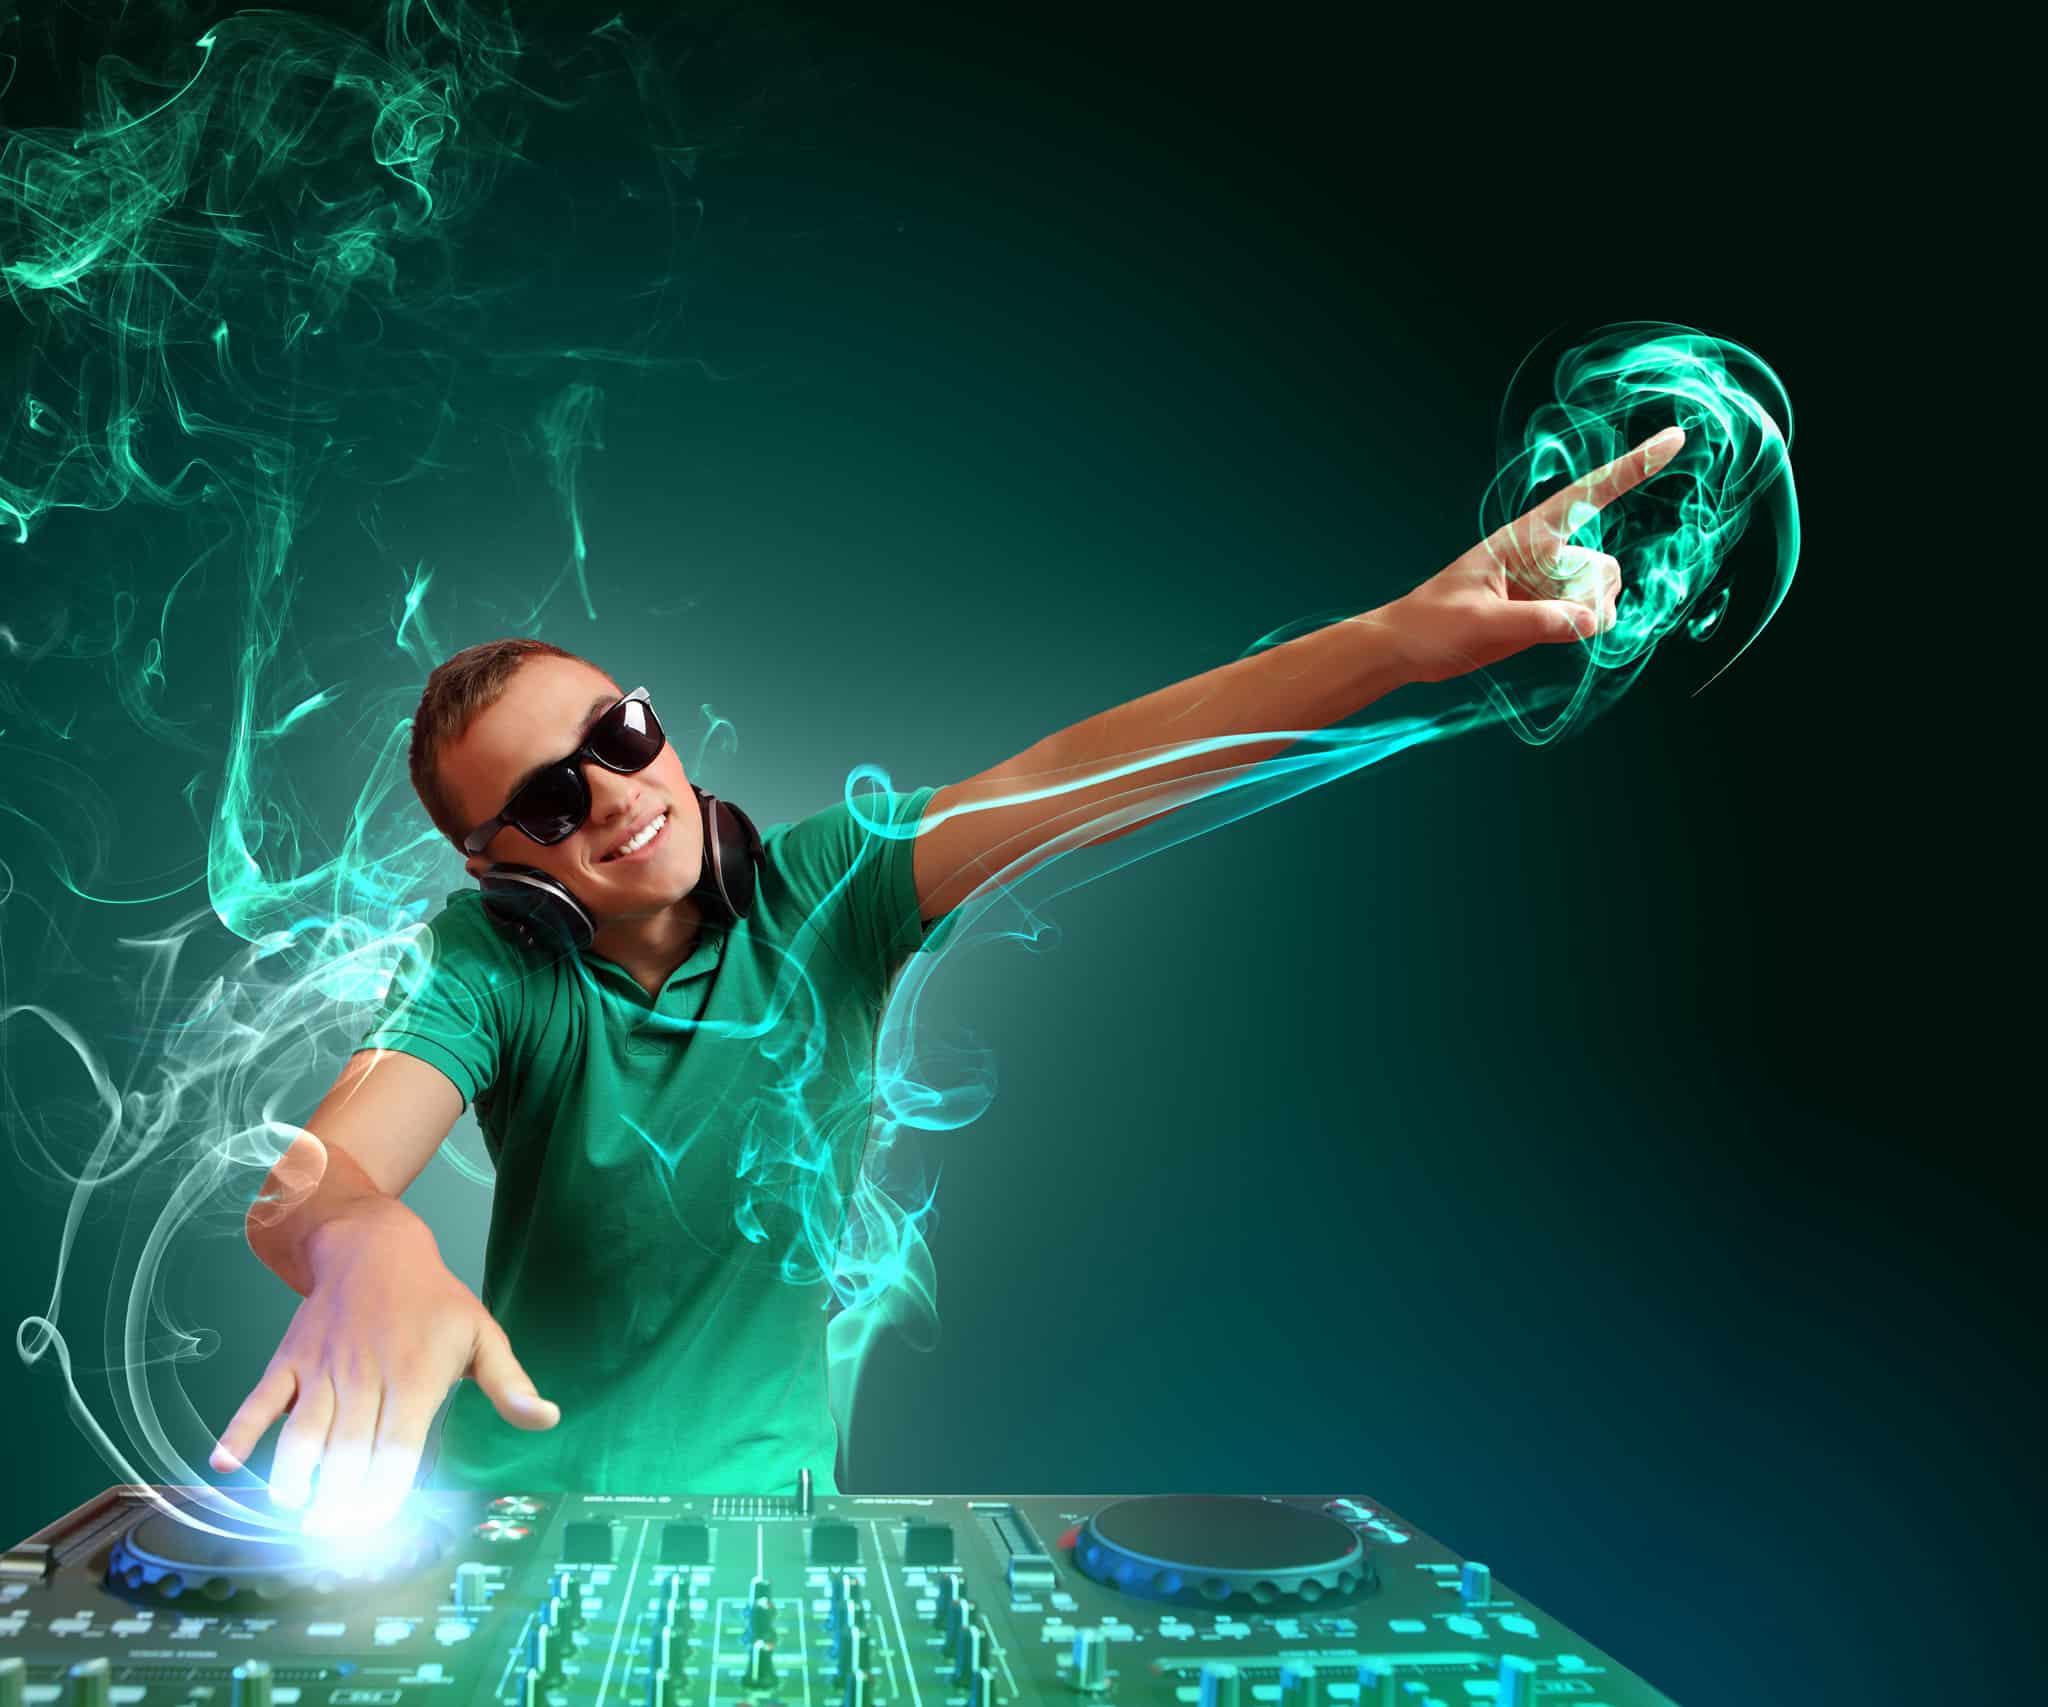 DJ Drops: Best female DJ drops, voice tags, mixtape drops ...